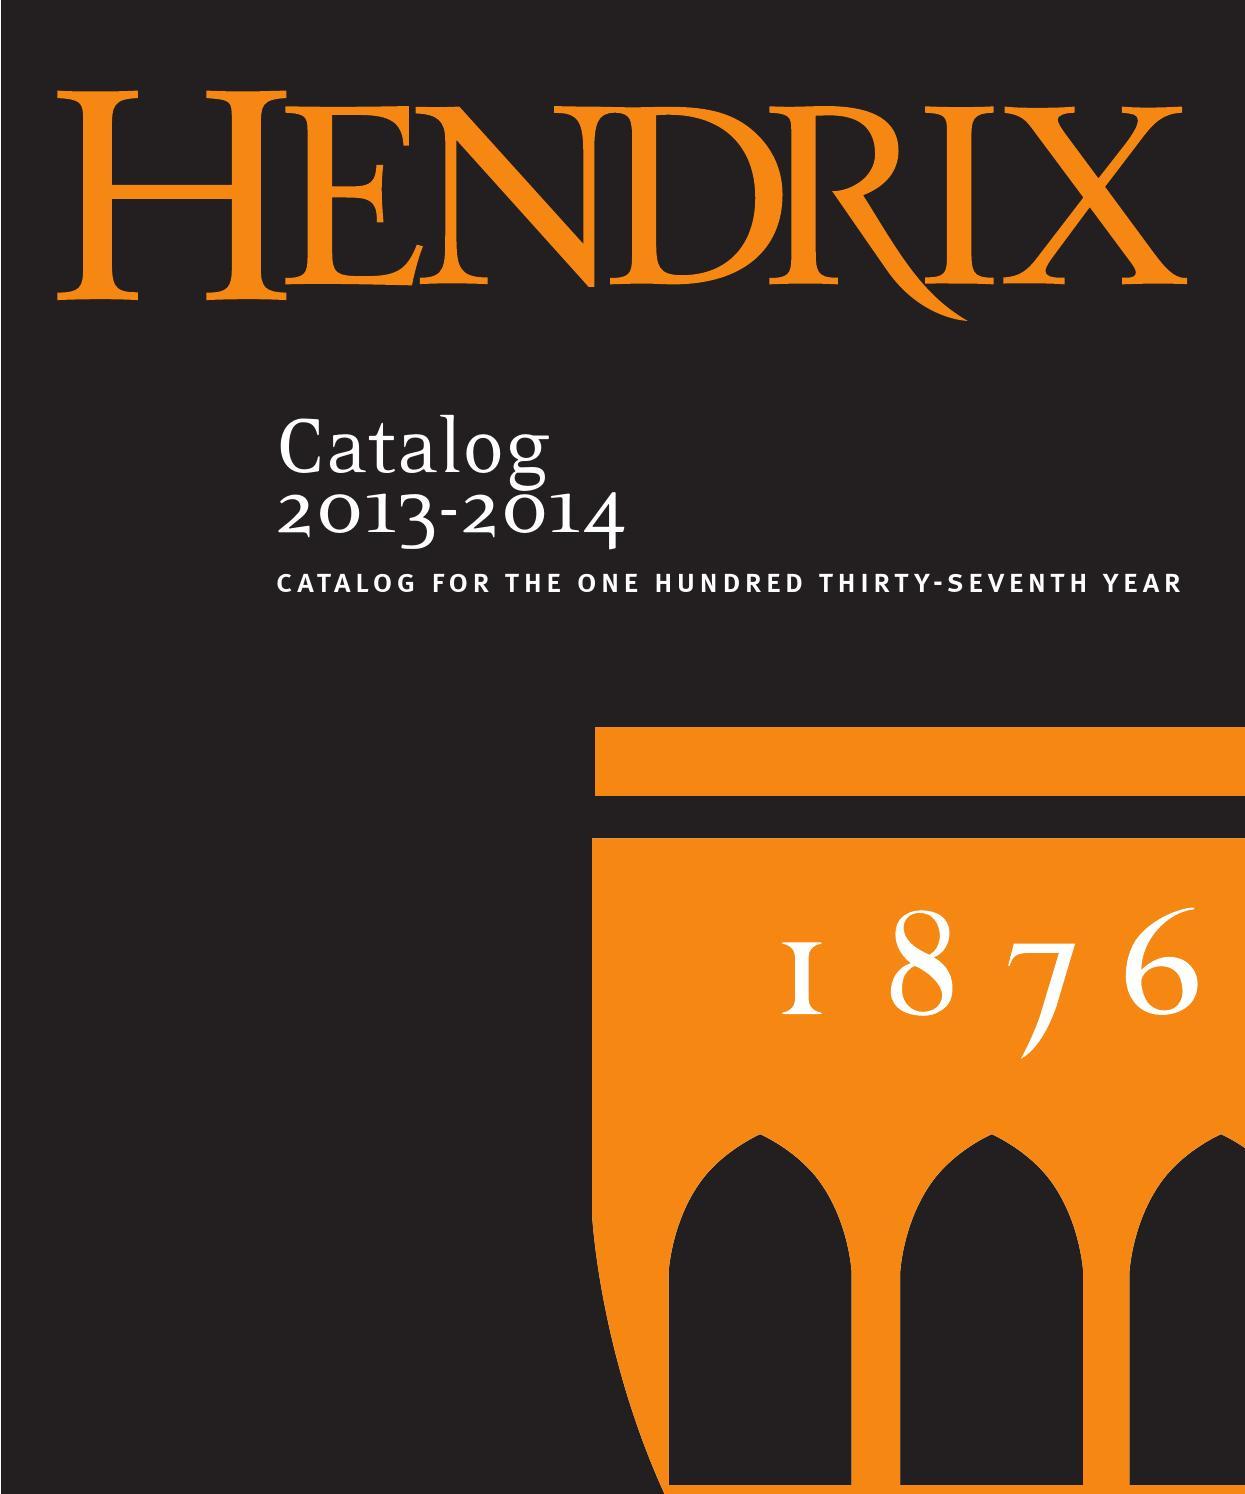 Hendrix catalog 2013 2014 by hendrix college issuu fandeluxe Image collections